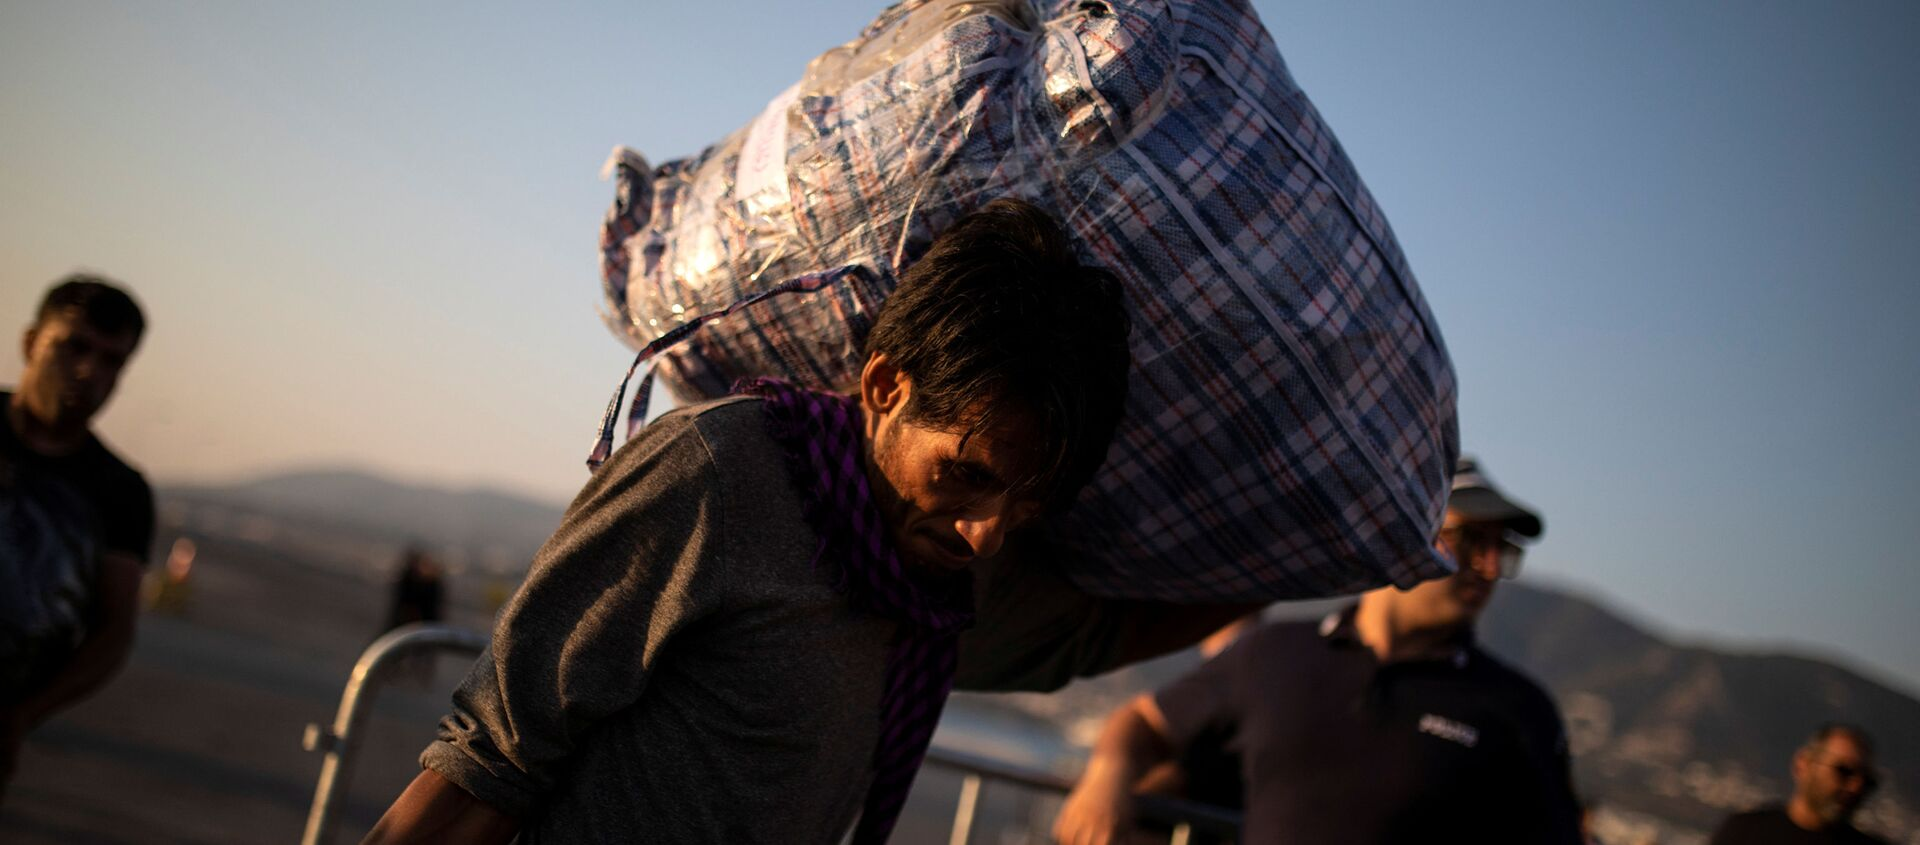 Migrante afghano in Grecia - Sputnik Italia, 1920, 05.10.2019